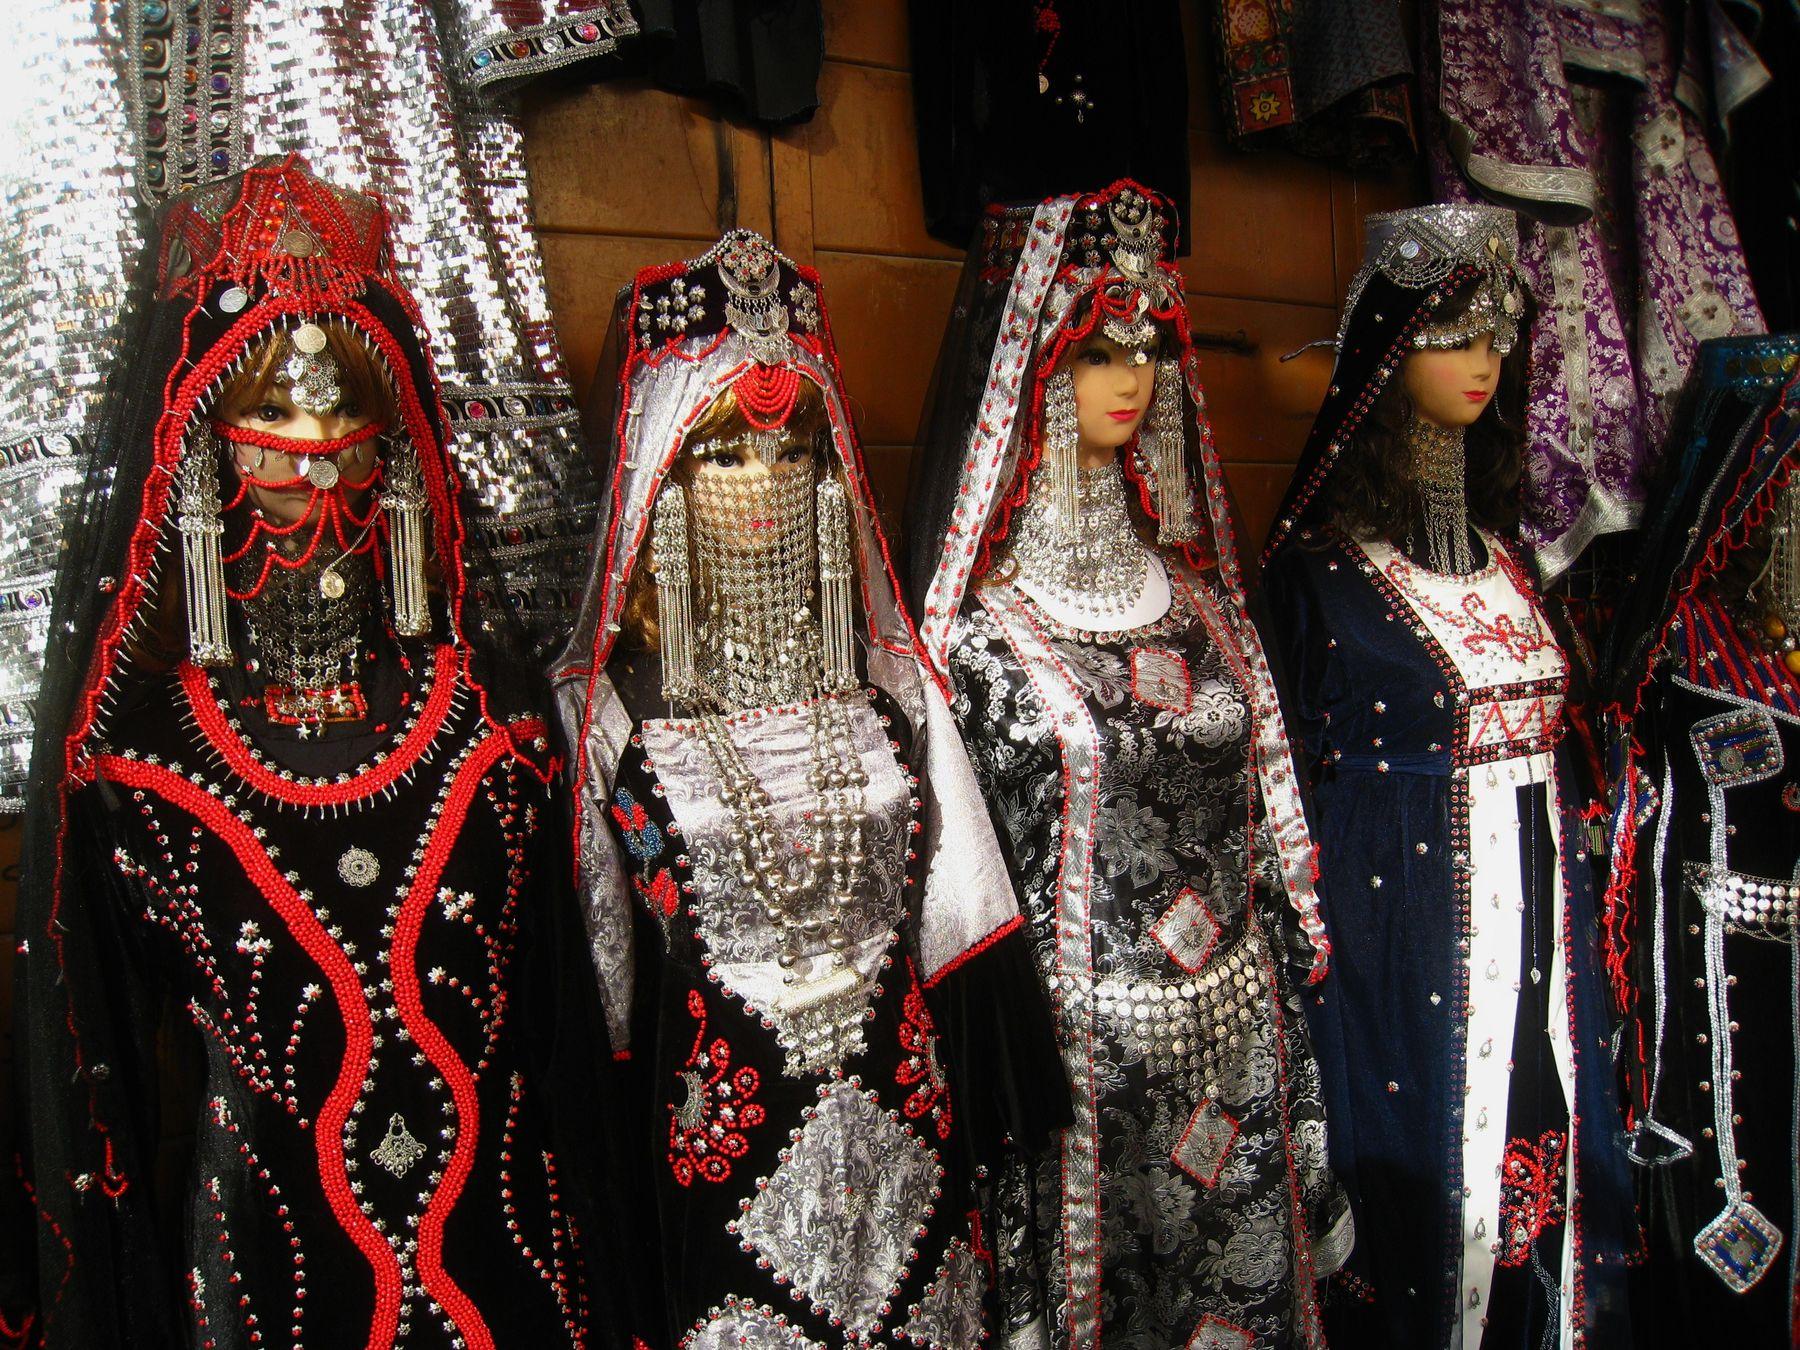 Самые красивые женские наряды. Йемен вулкан кратер горы скалы